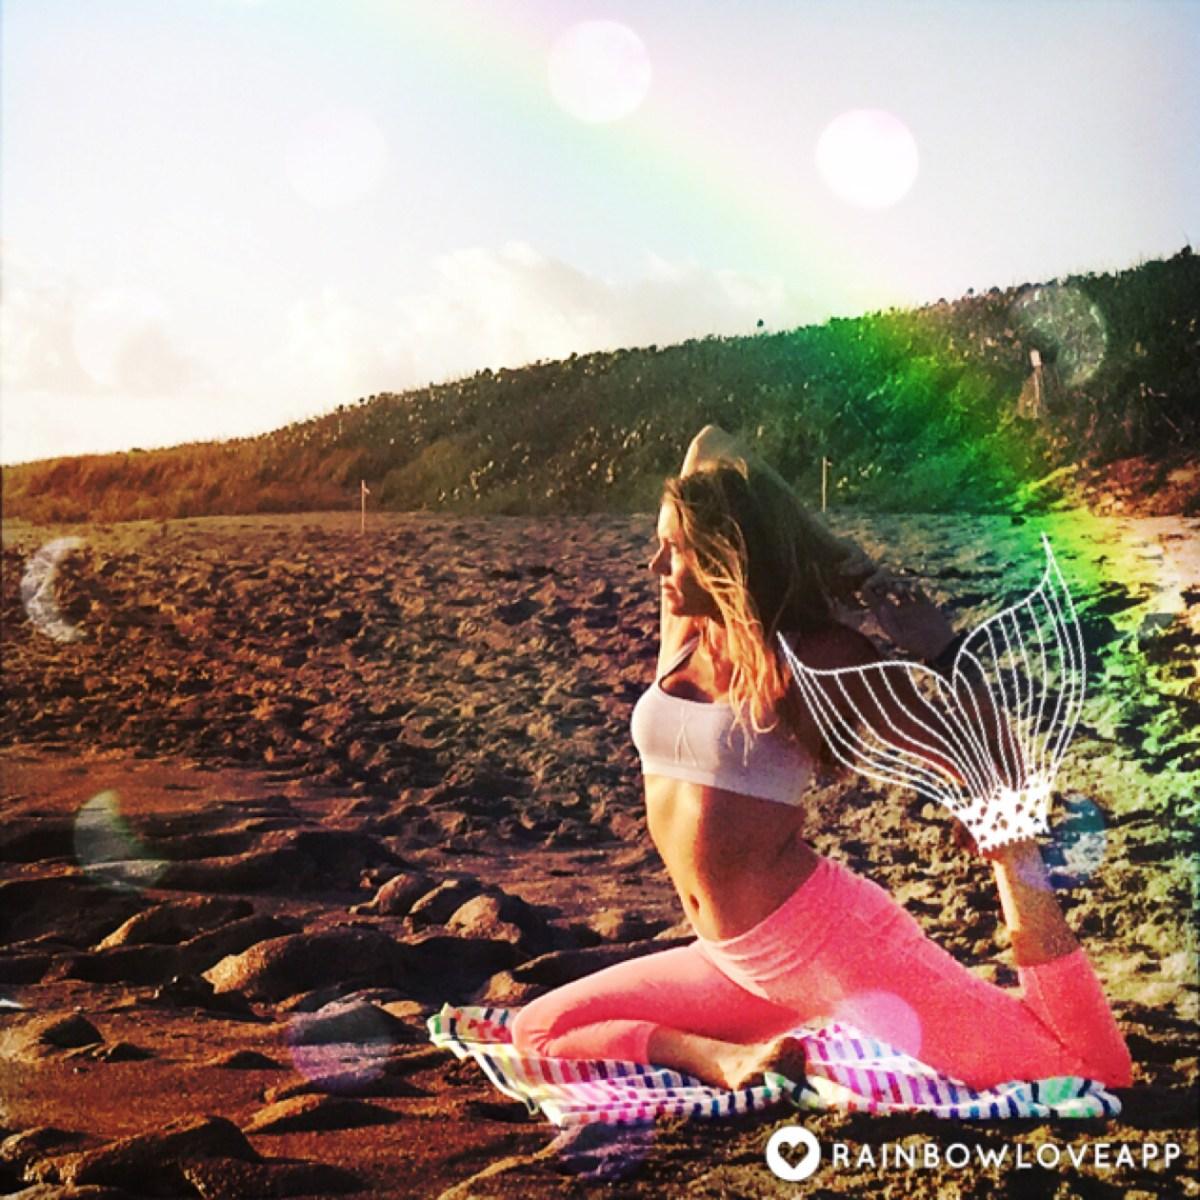 rainbow-love-app-moon-filters-and-moon-art-best-photo-editing-apps-mermaid-fin-mermaid-yogi-apps